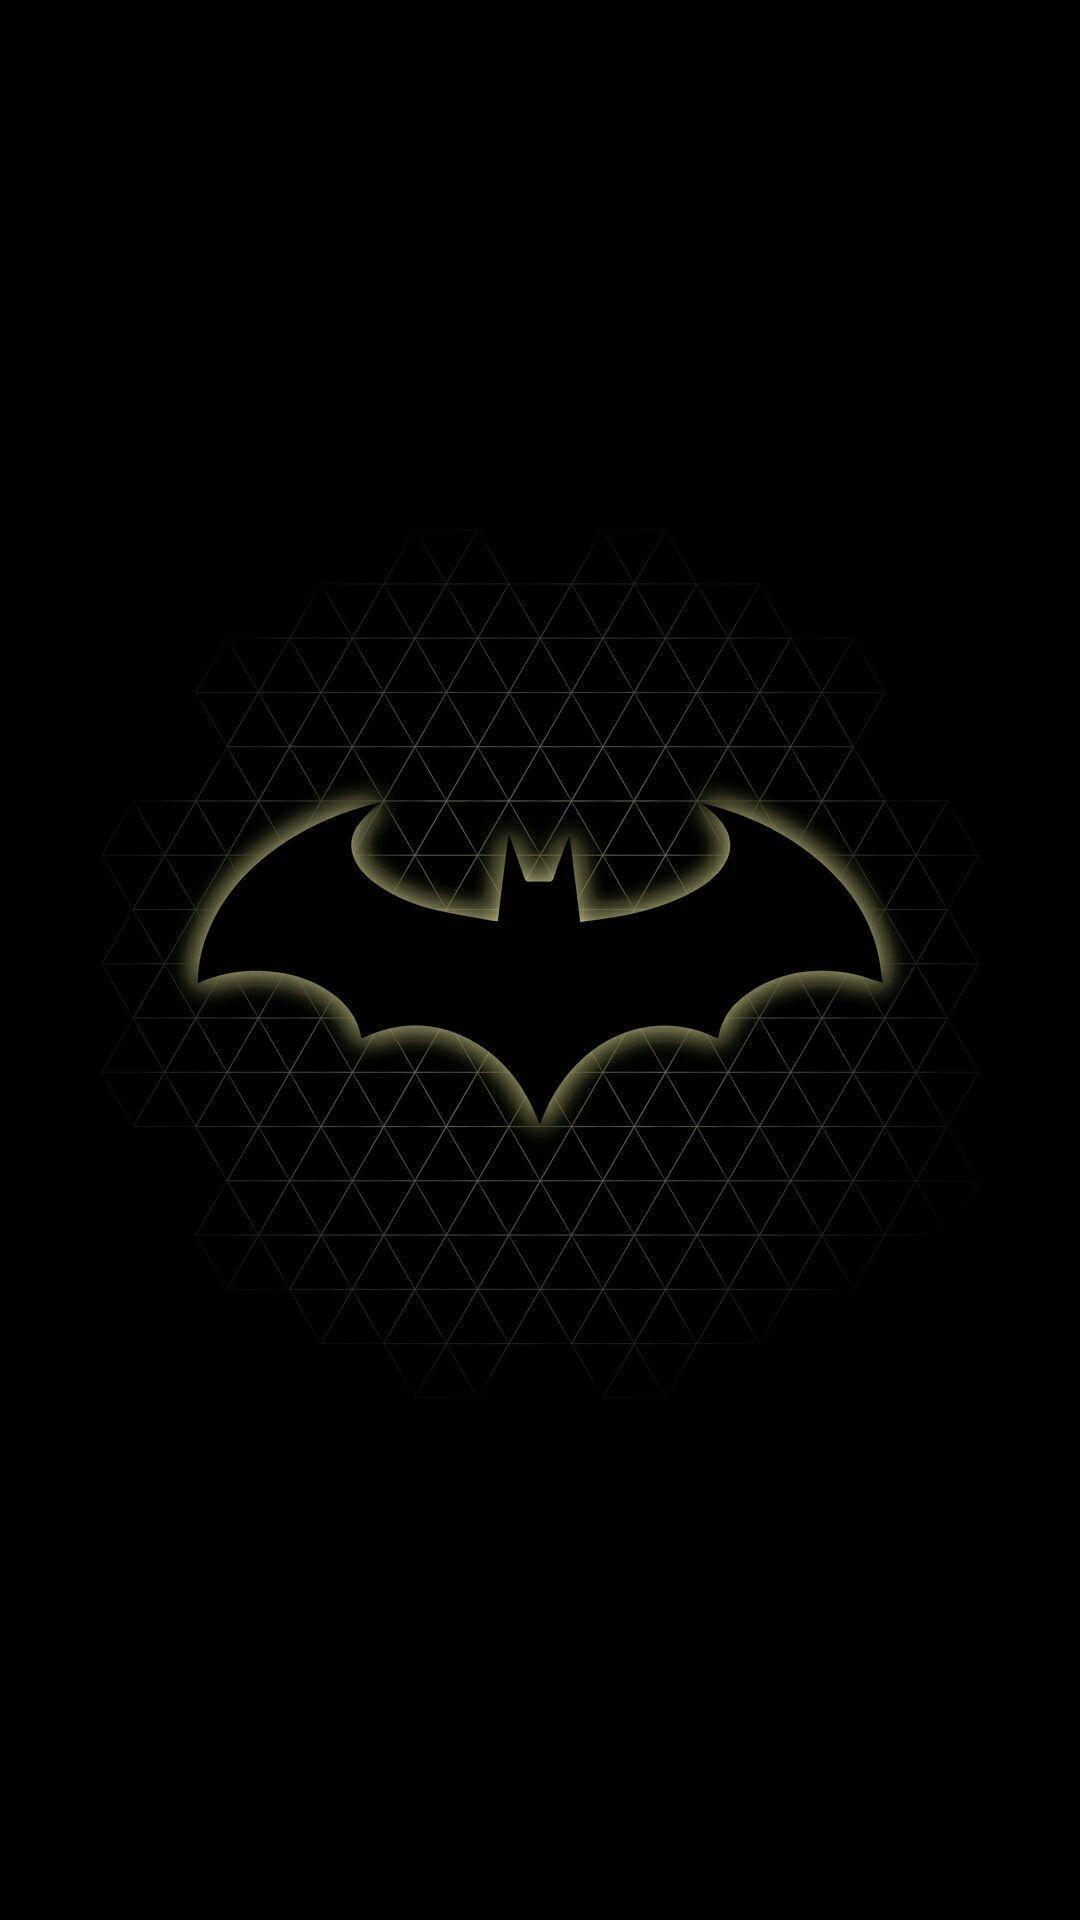 Batman Logo Wallpapers Android Wallpaper Cave